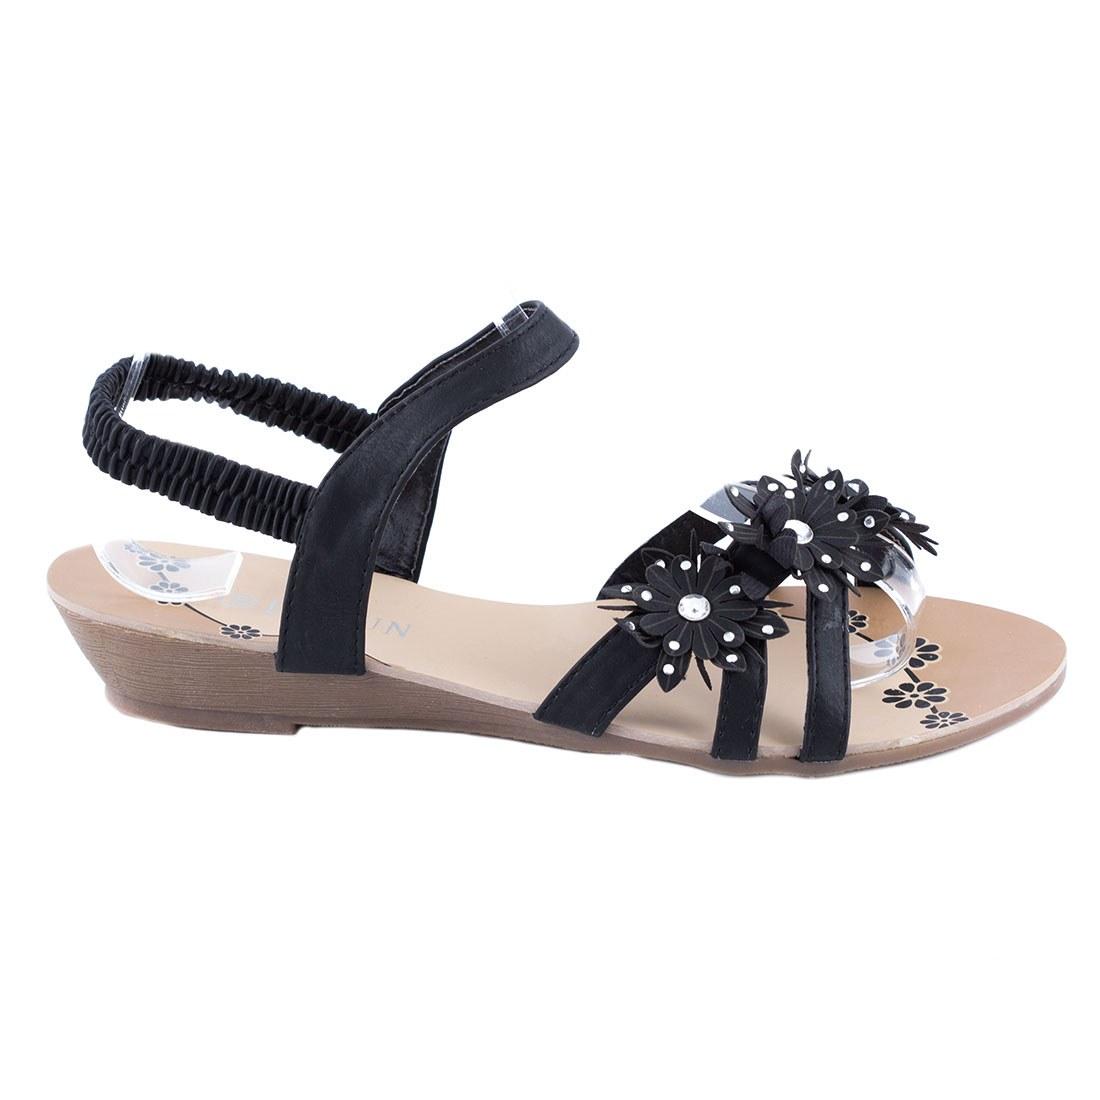 Sandale dama cu talpa joasa JK-56-BEJ la 29,99Lei - Zibra.ro